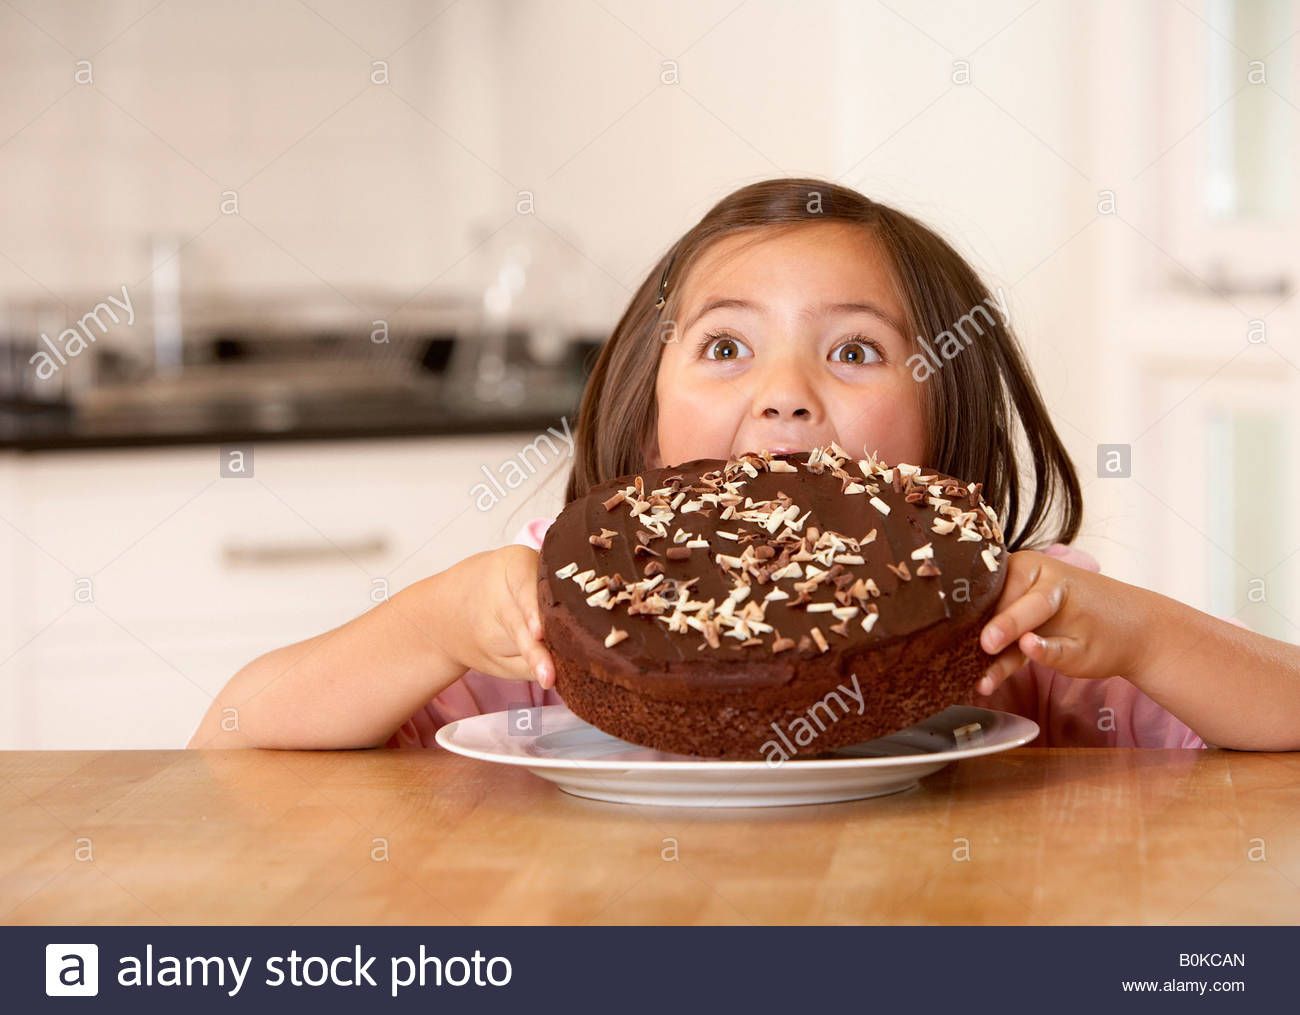 Eating Too Much Birthday Cake